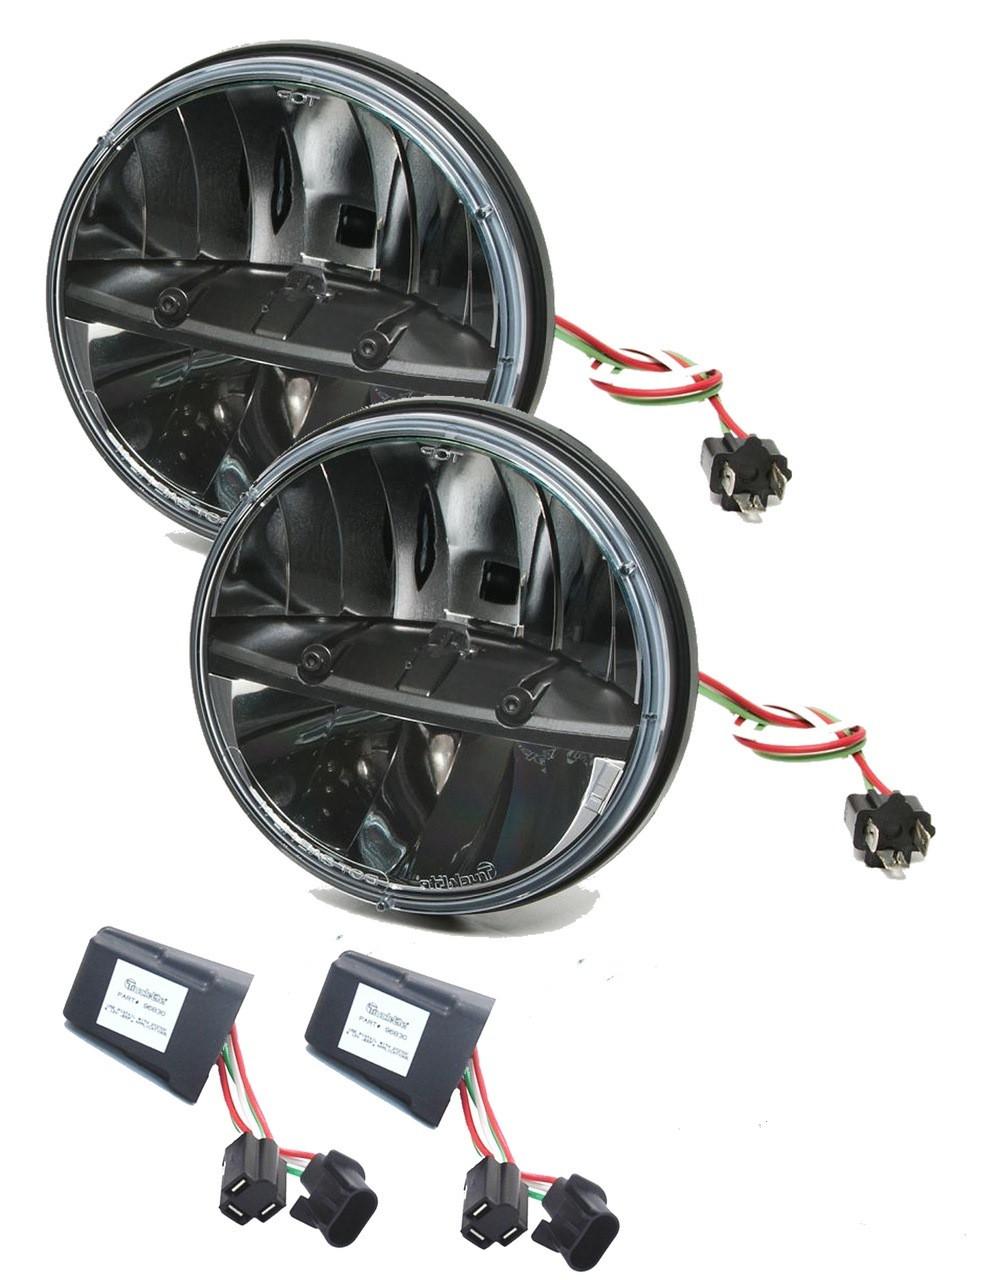 truck lite 27270c jeep jk kit 7 round led headlight pair anti rh drivetrainamerica com